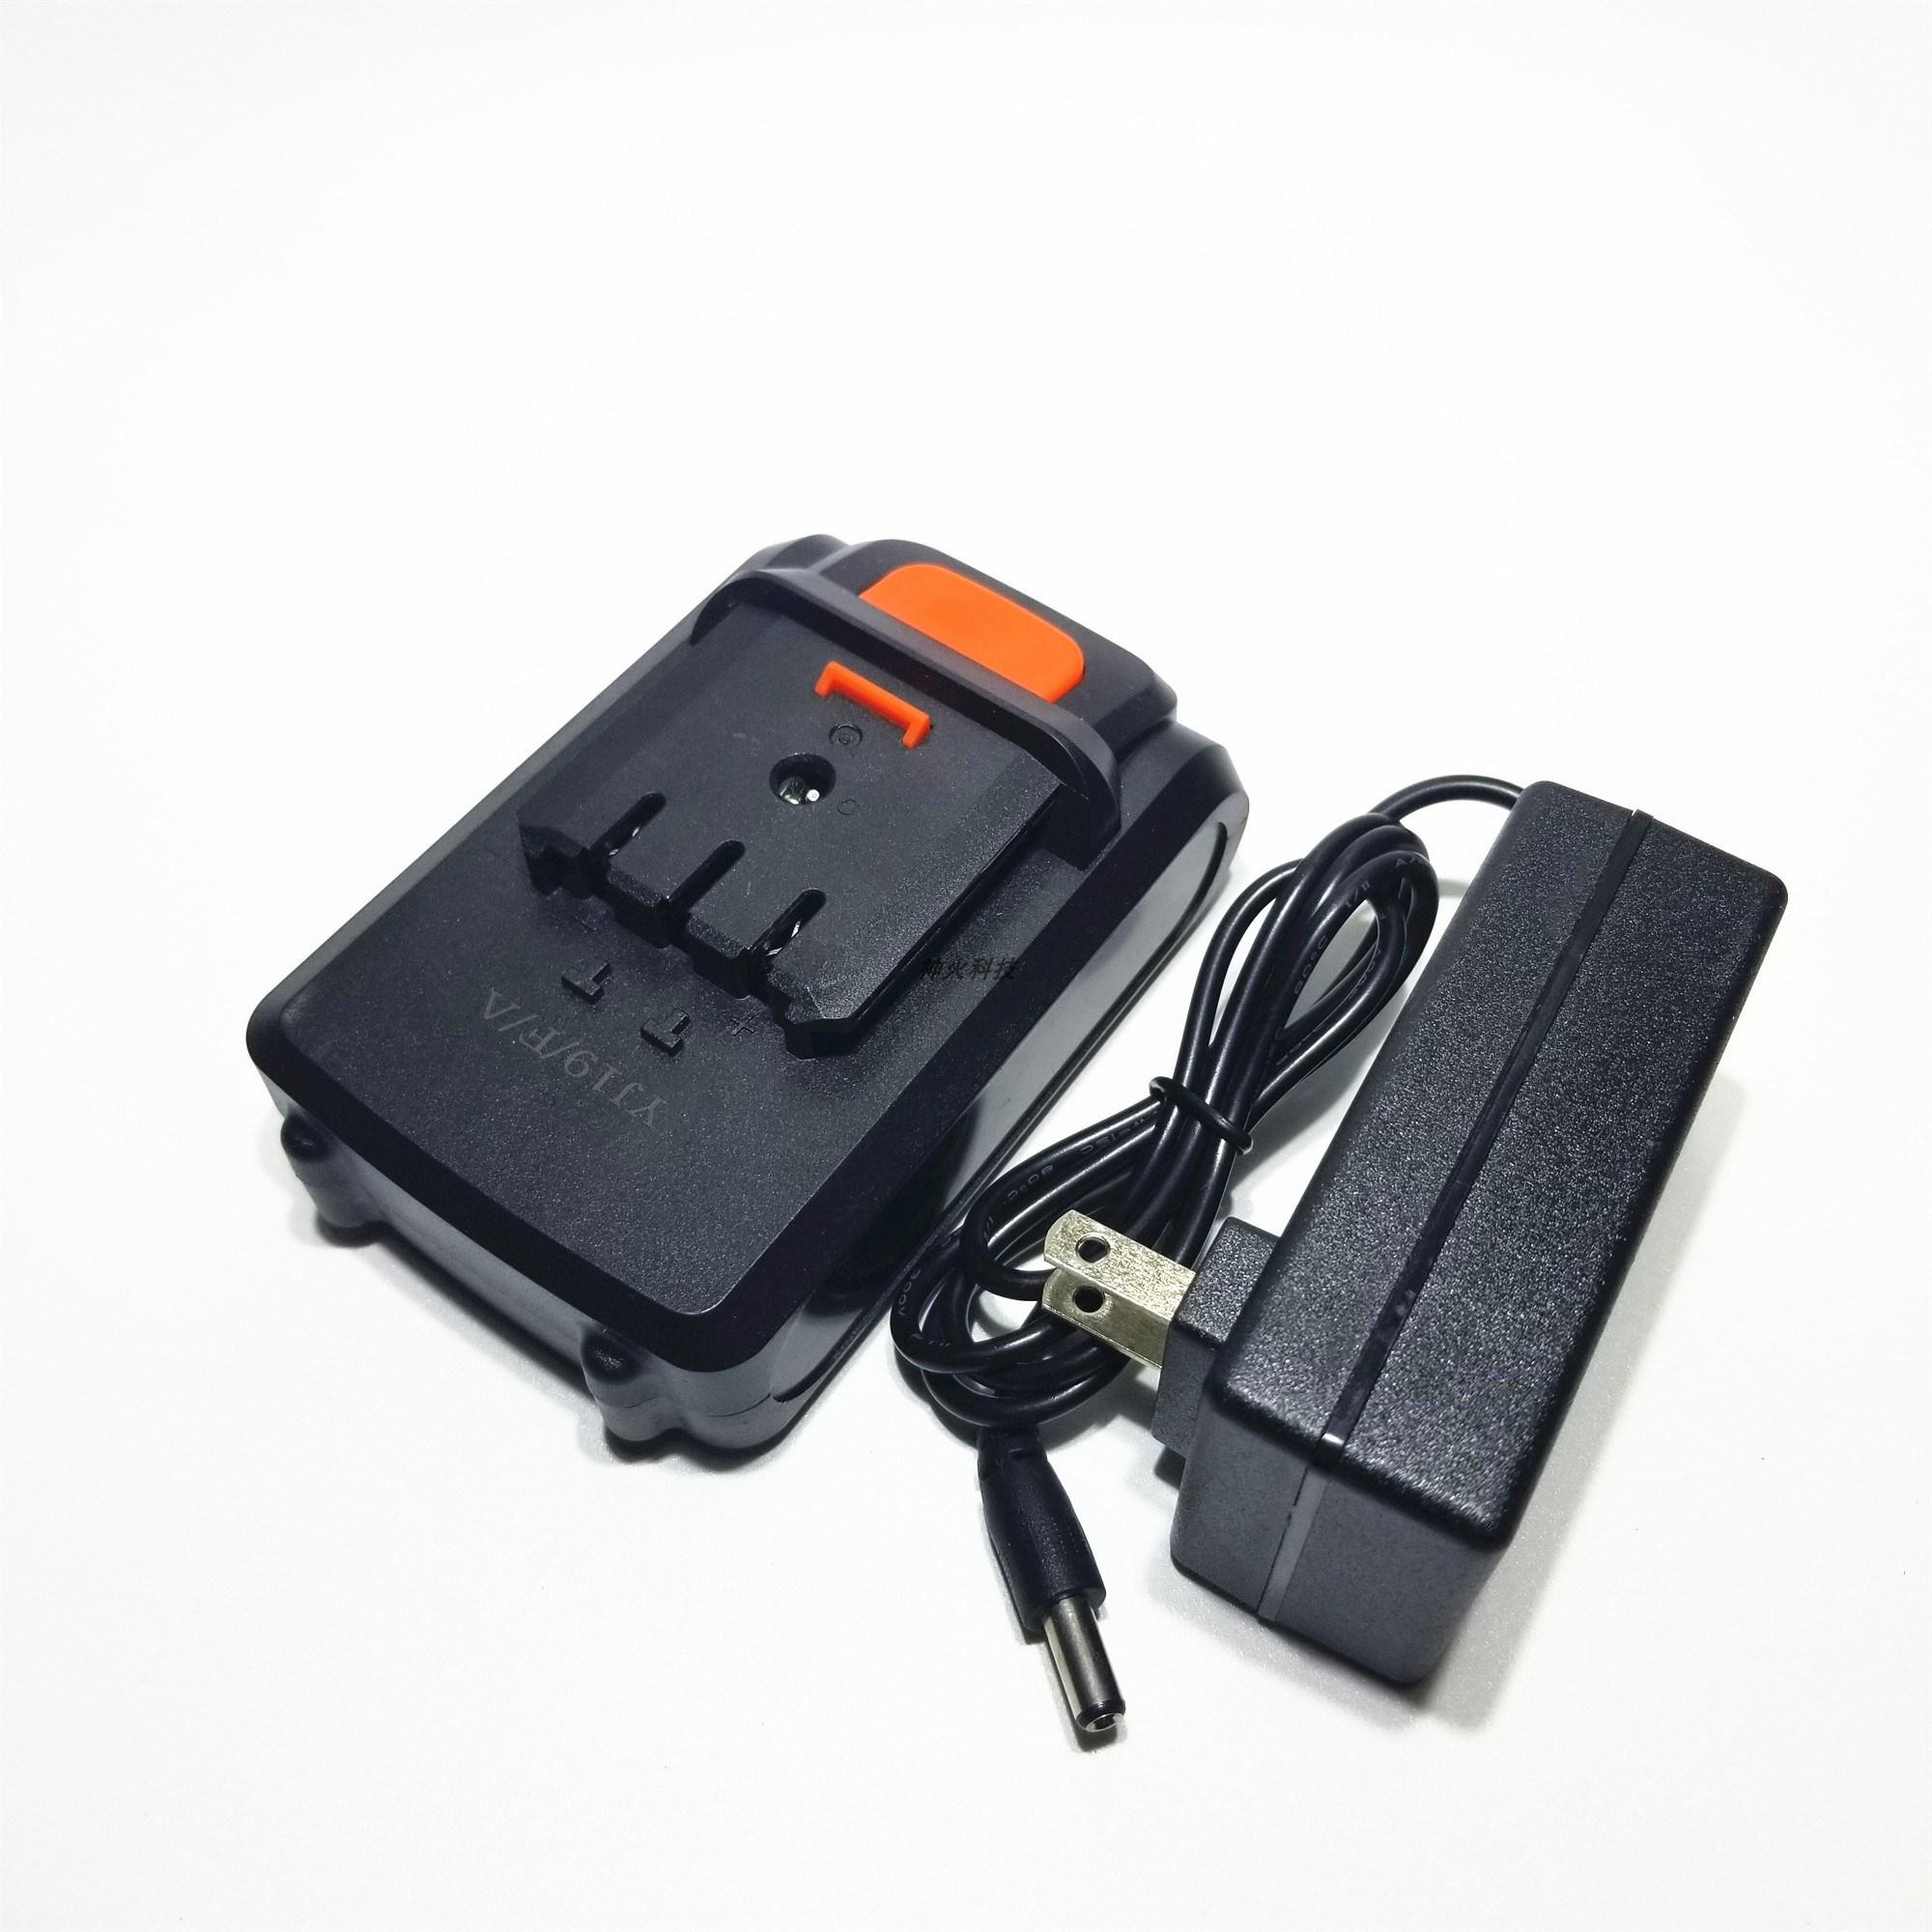 Baoyou gun god 25V electric hand drill lithium battery lithium electric drill charging electric drill impact drill electric tool charger